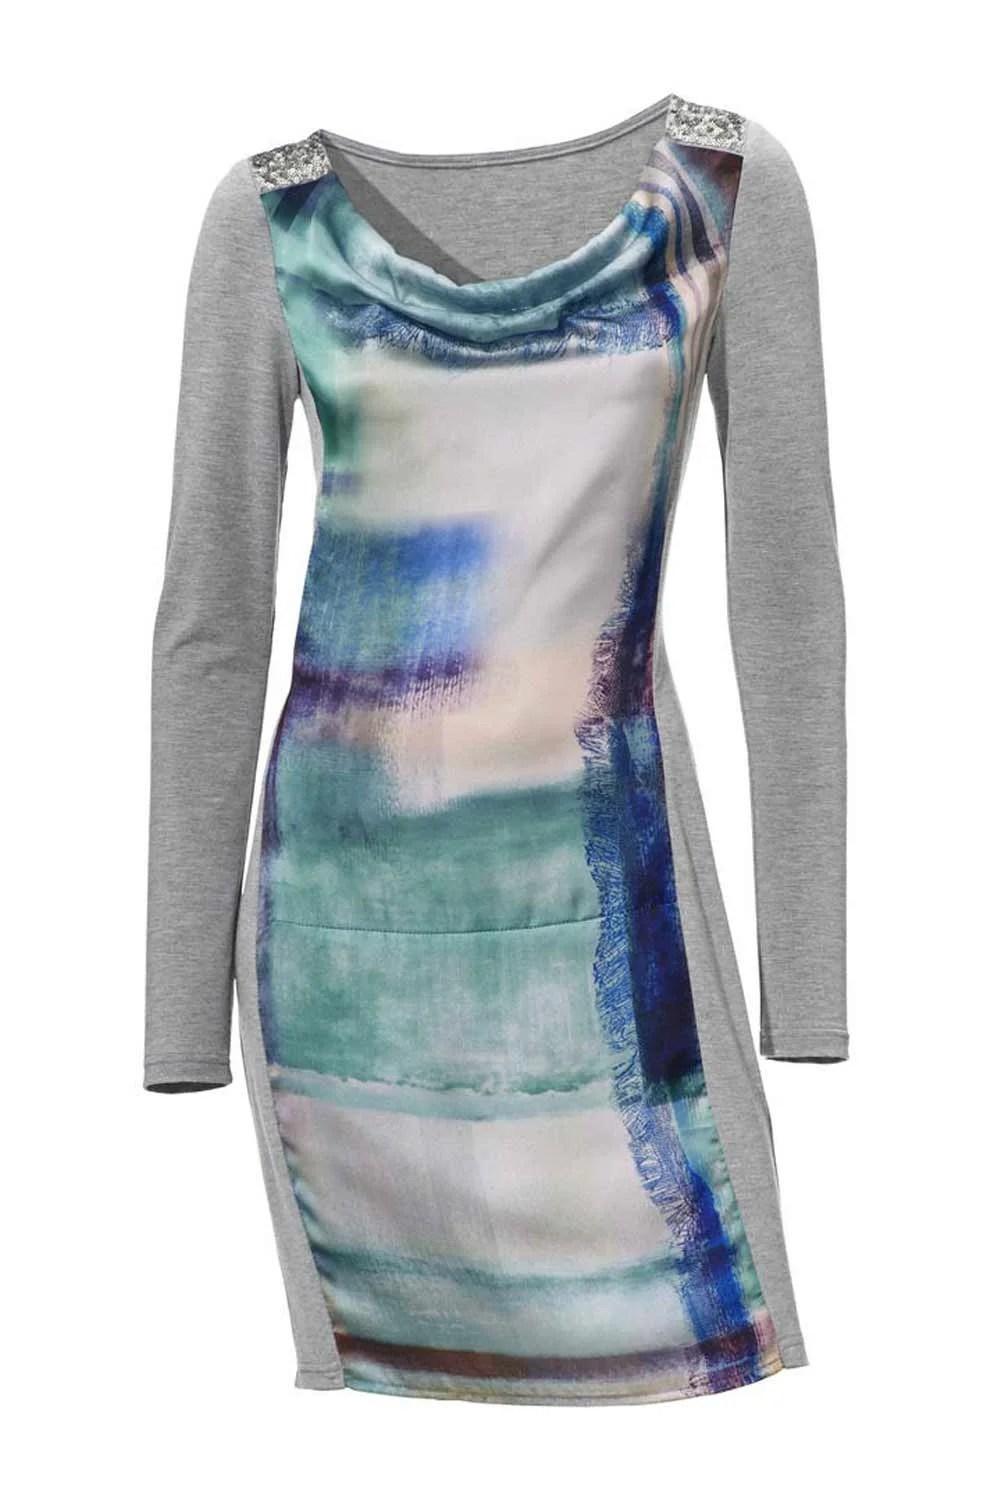 164.435 ASHLEY BROOKE Damen Designer-Kleid Grau-Jade